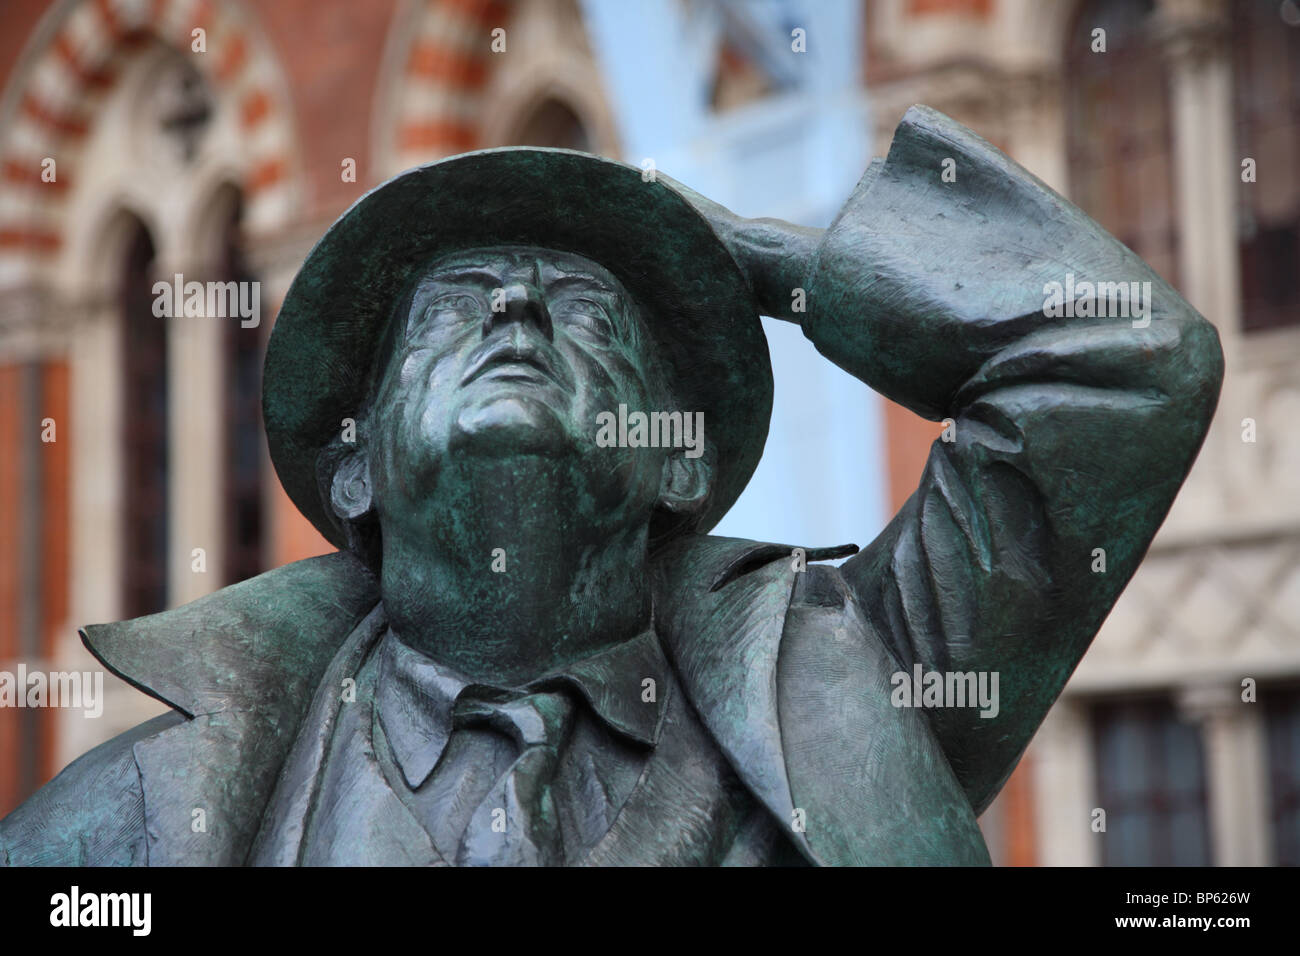 John Betjeman's Sculpture at St Pancras Station, Camden, London, NW1. - Stock Image